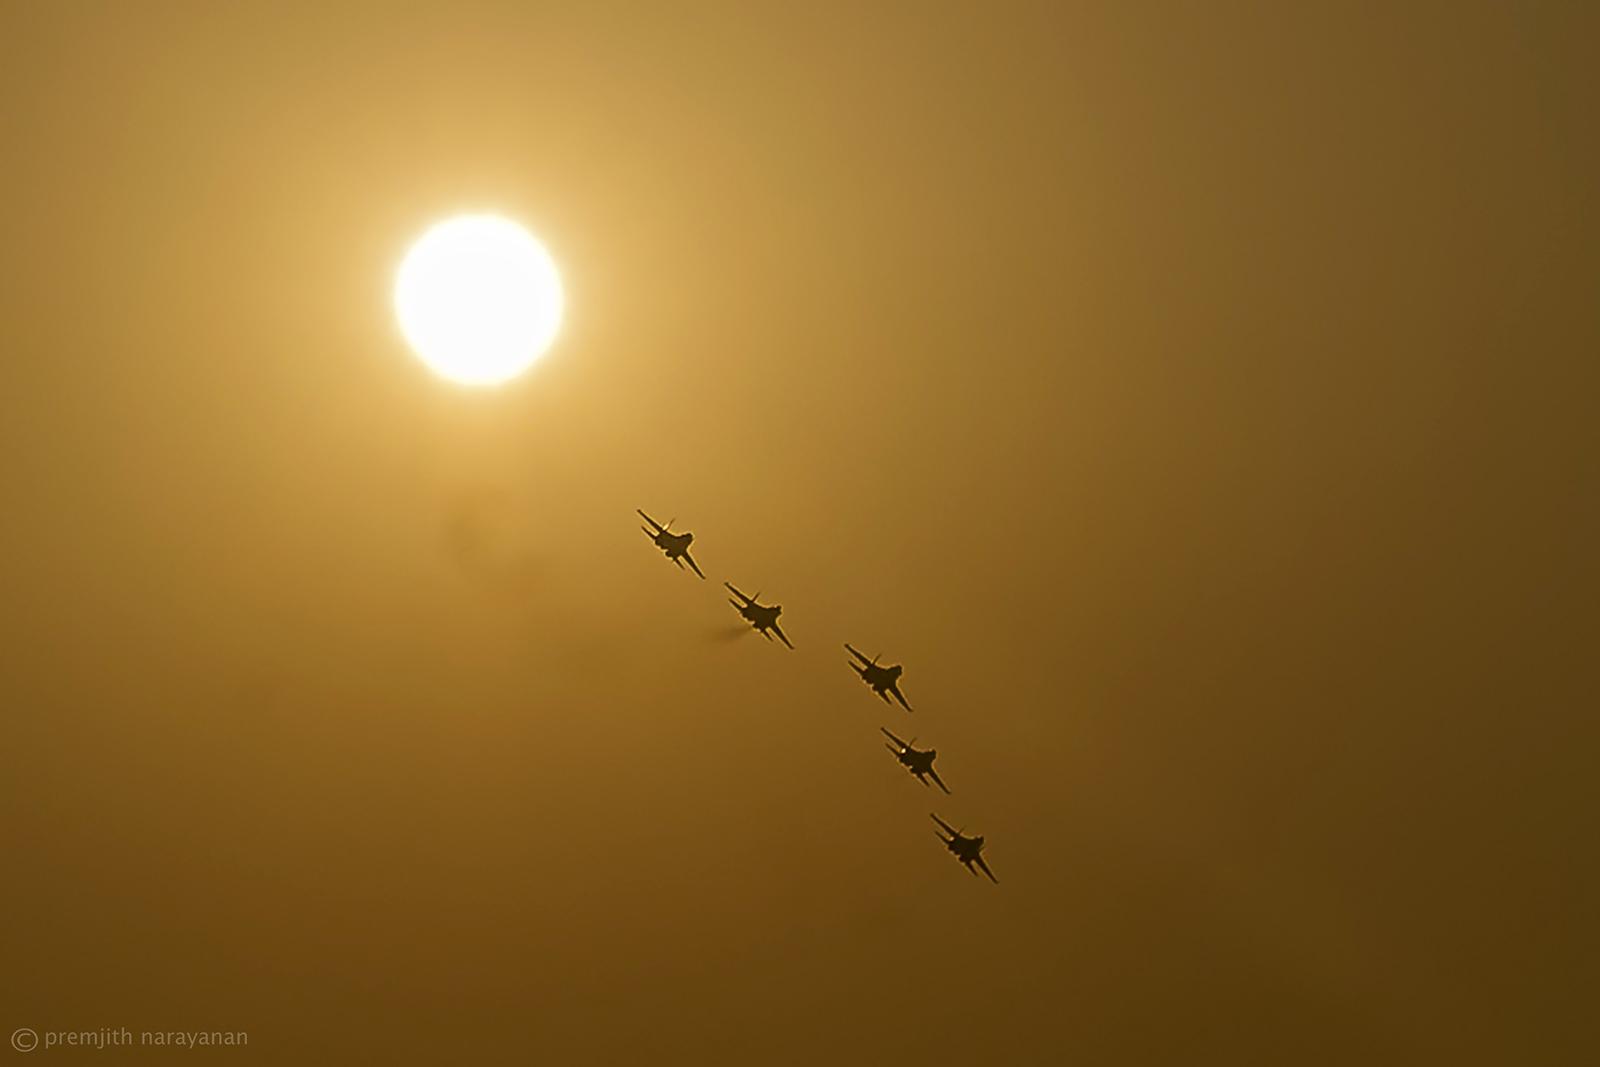 the Russian Knights - SUKHOI Su-27s